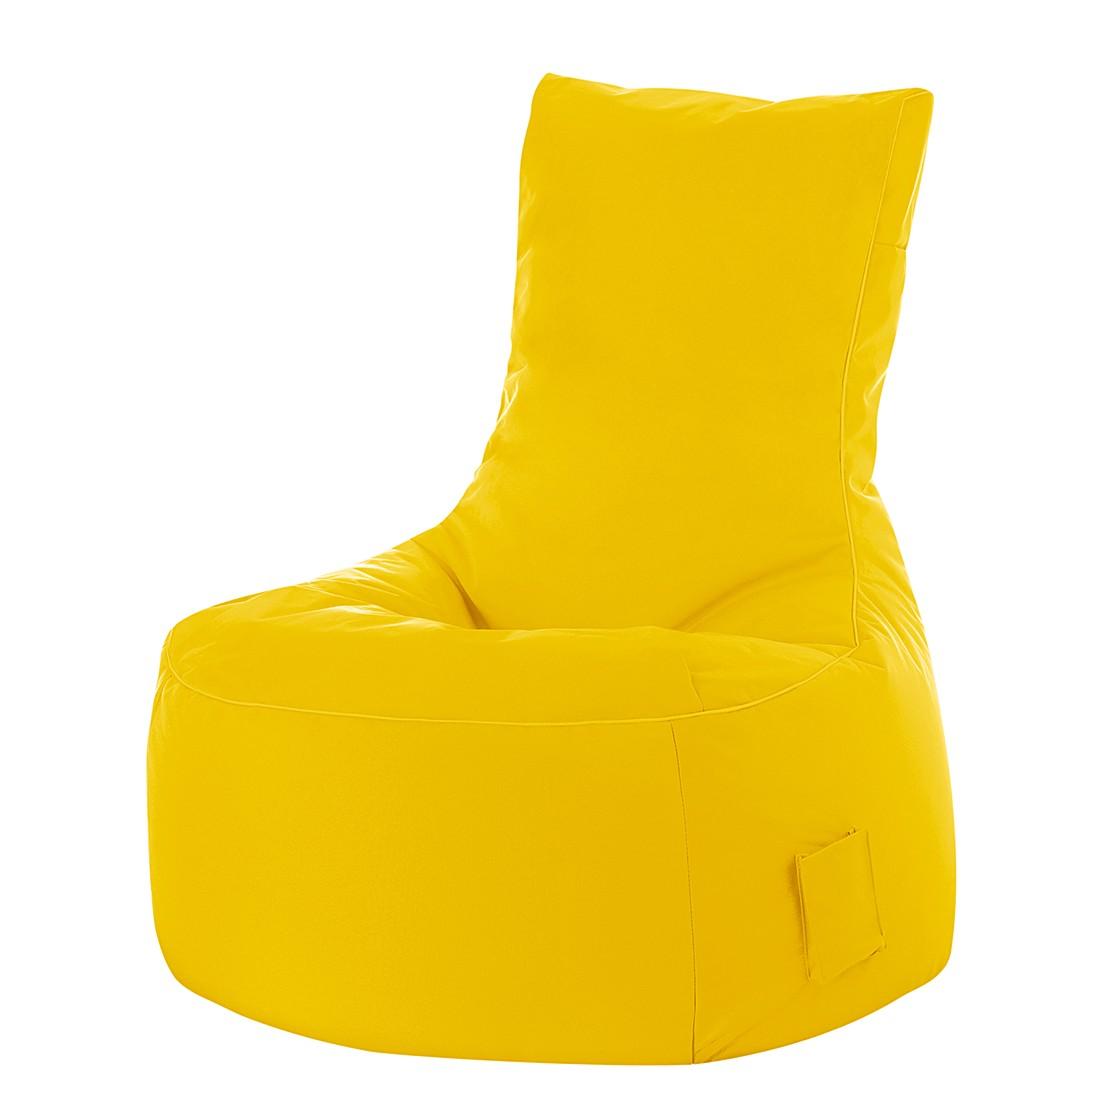 Sitzsack Scuba Swing – Gelb, Fredriks jetzt kaufen